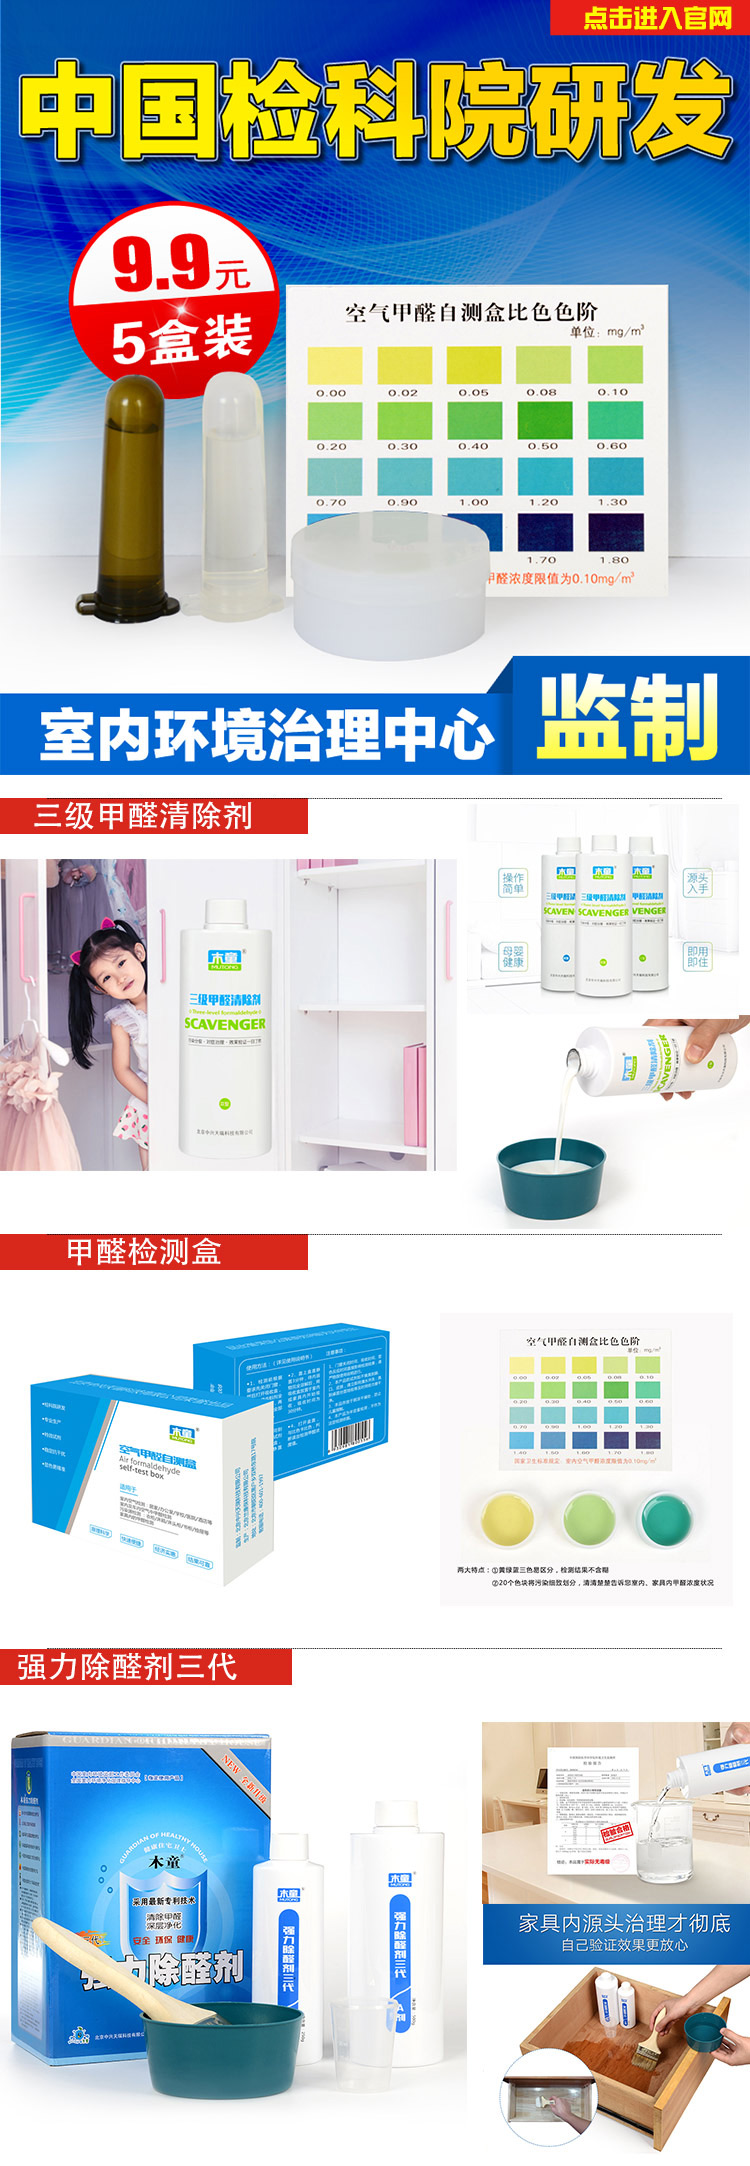 http://www.hjw123.com/huanbaochanye/84710.html